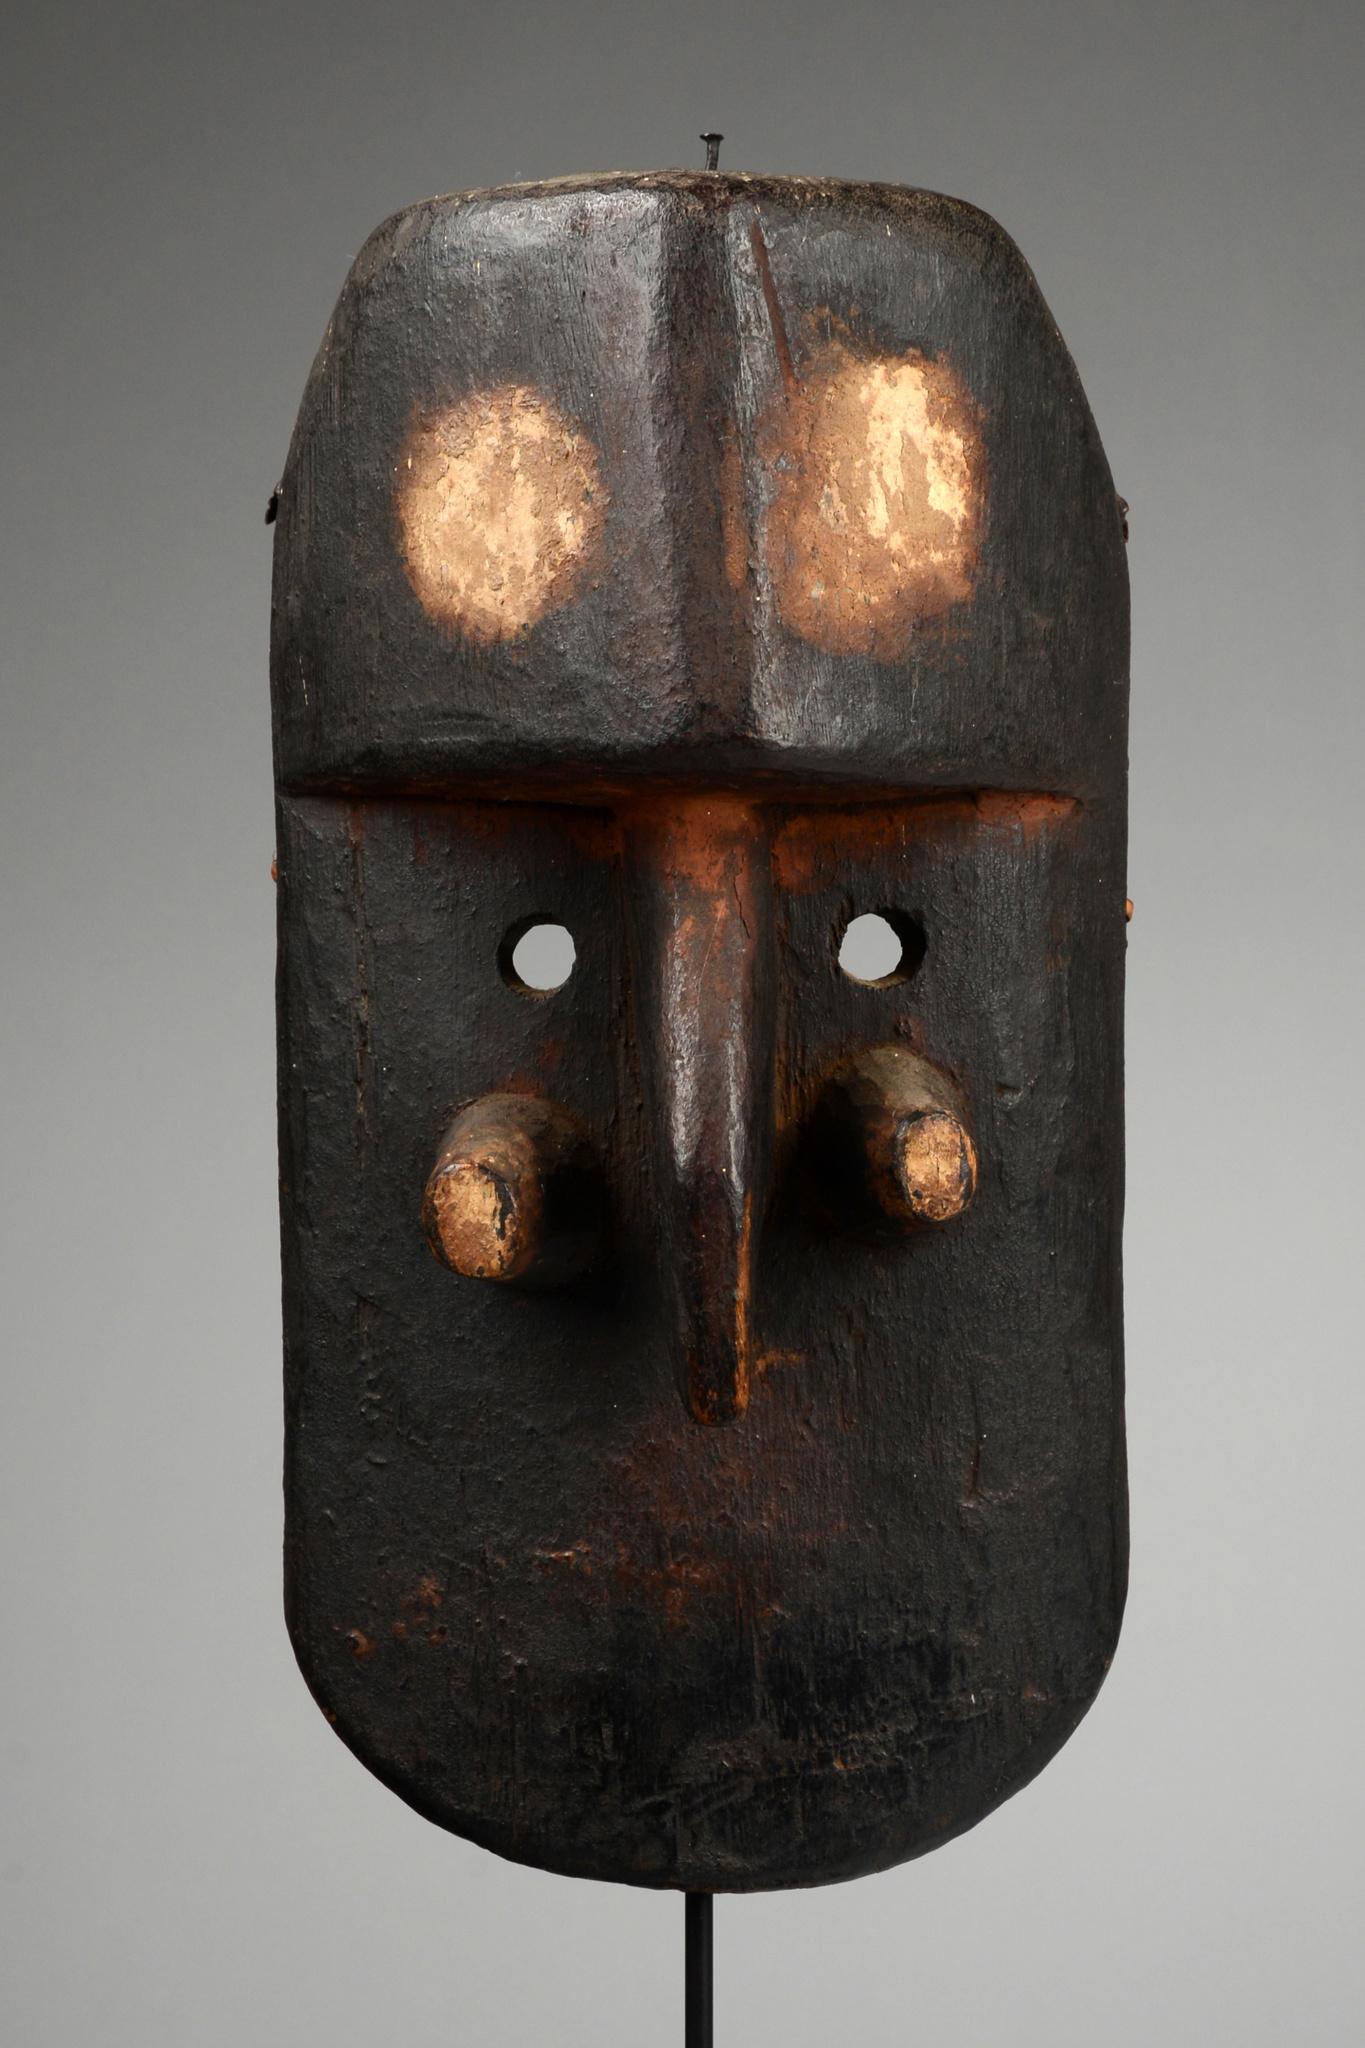 Expressive face mask